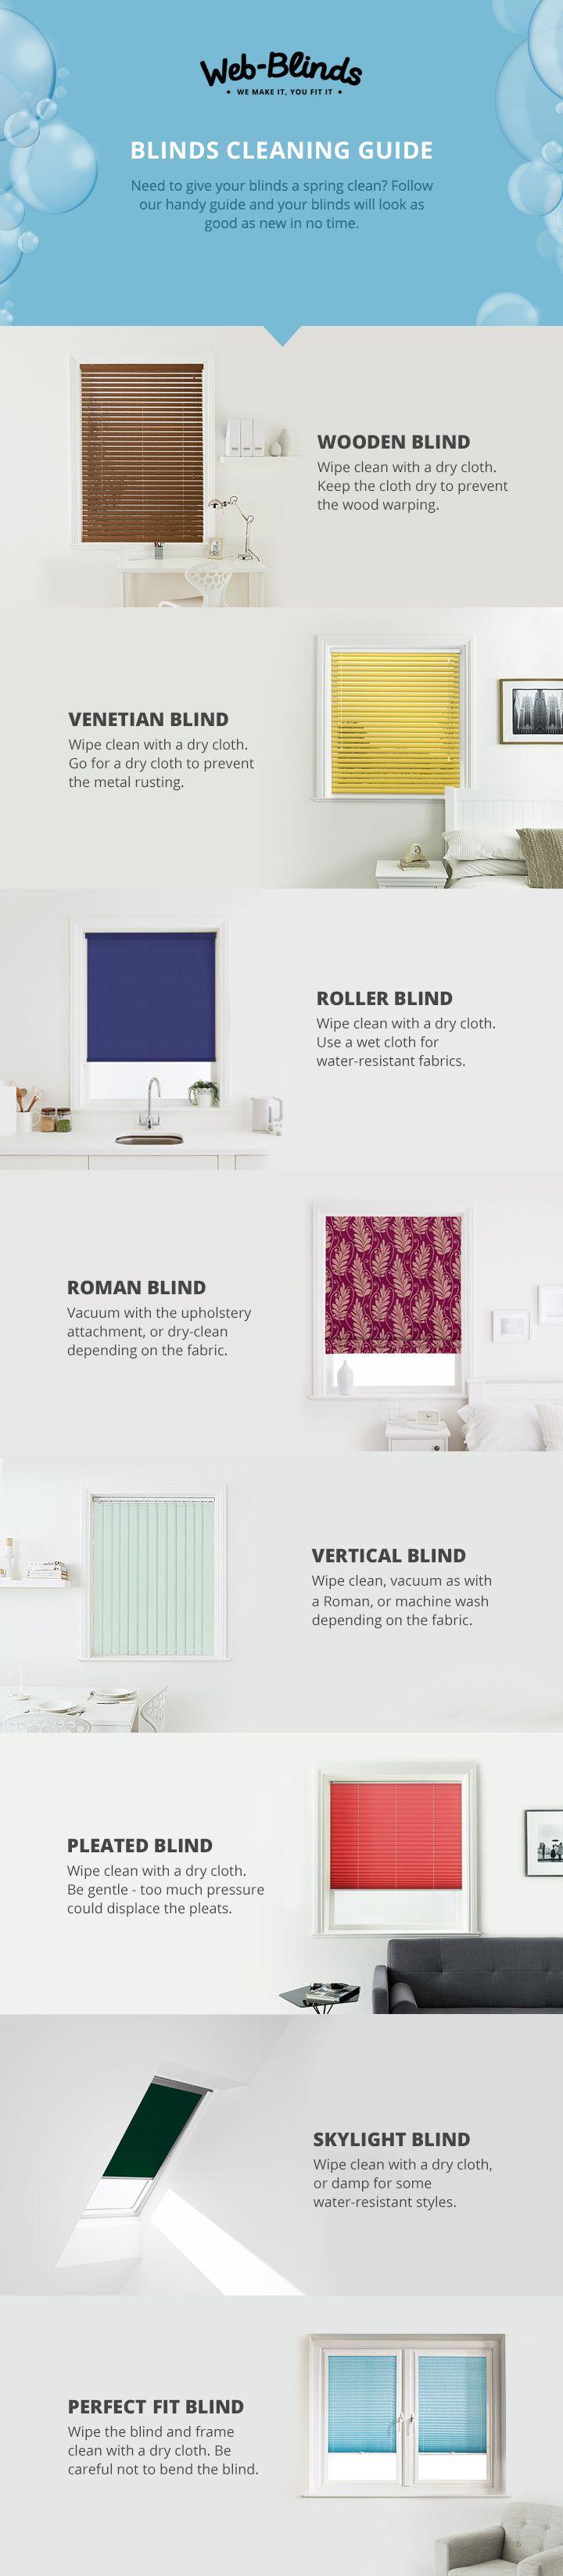 Roman Blind Diy Best 25 Buy Blinds Online Ideas On Pinterest Roman Online Diy